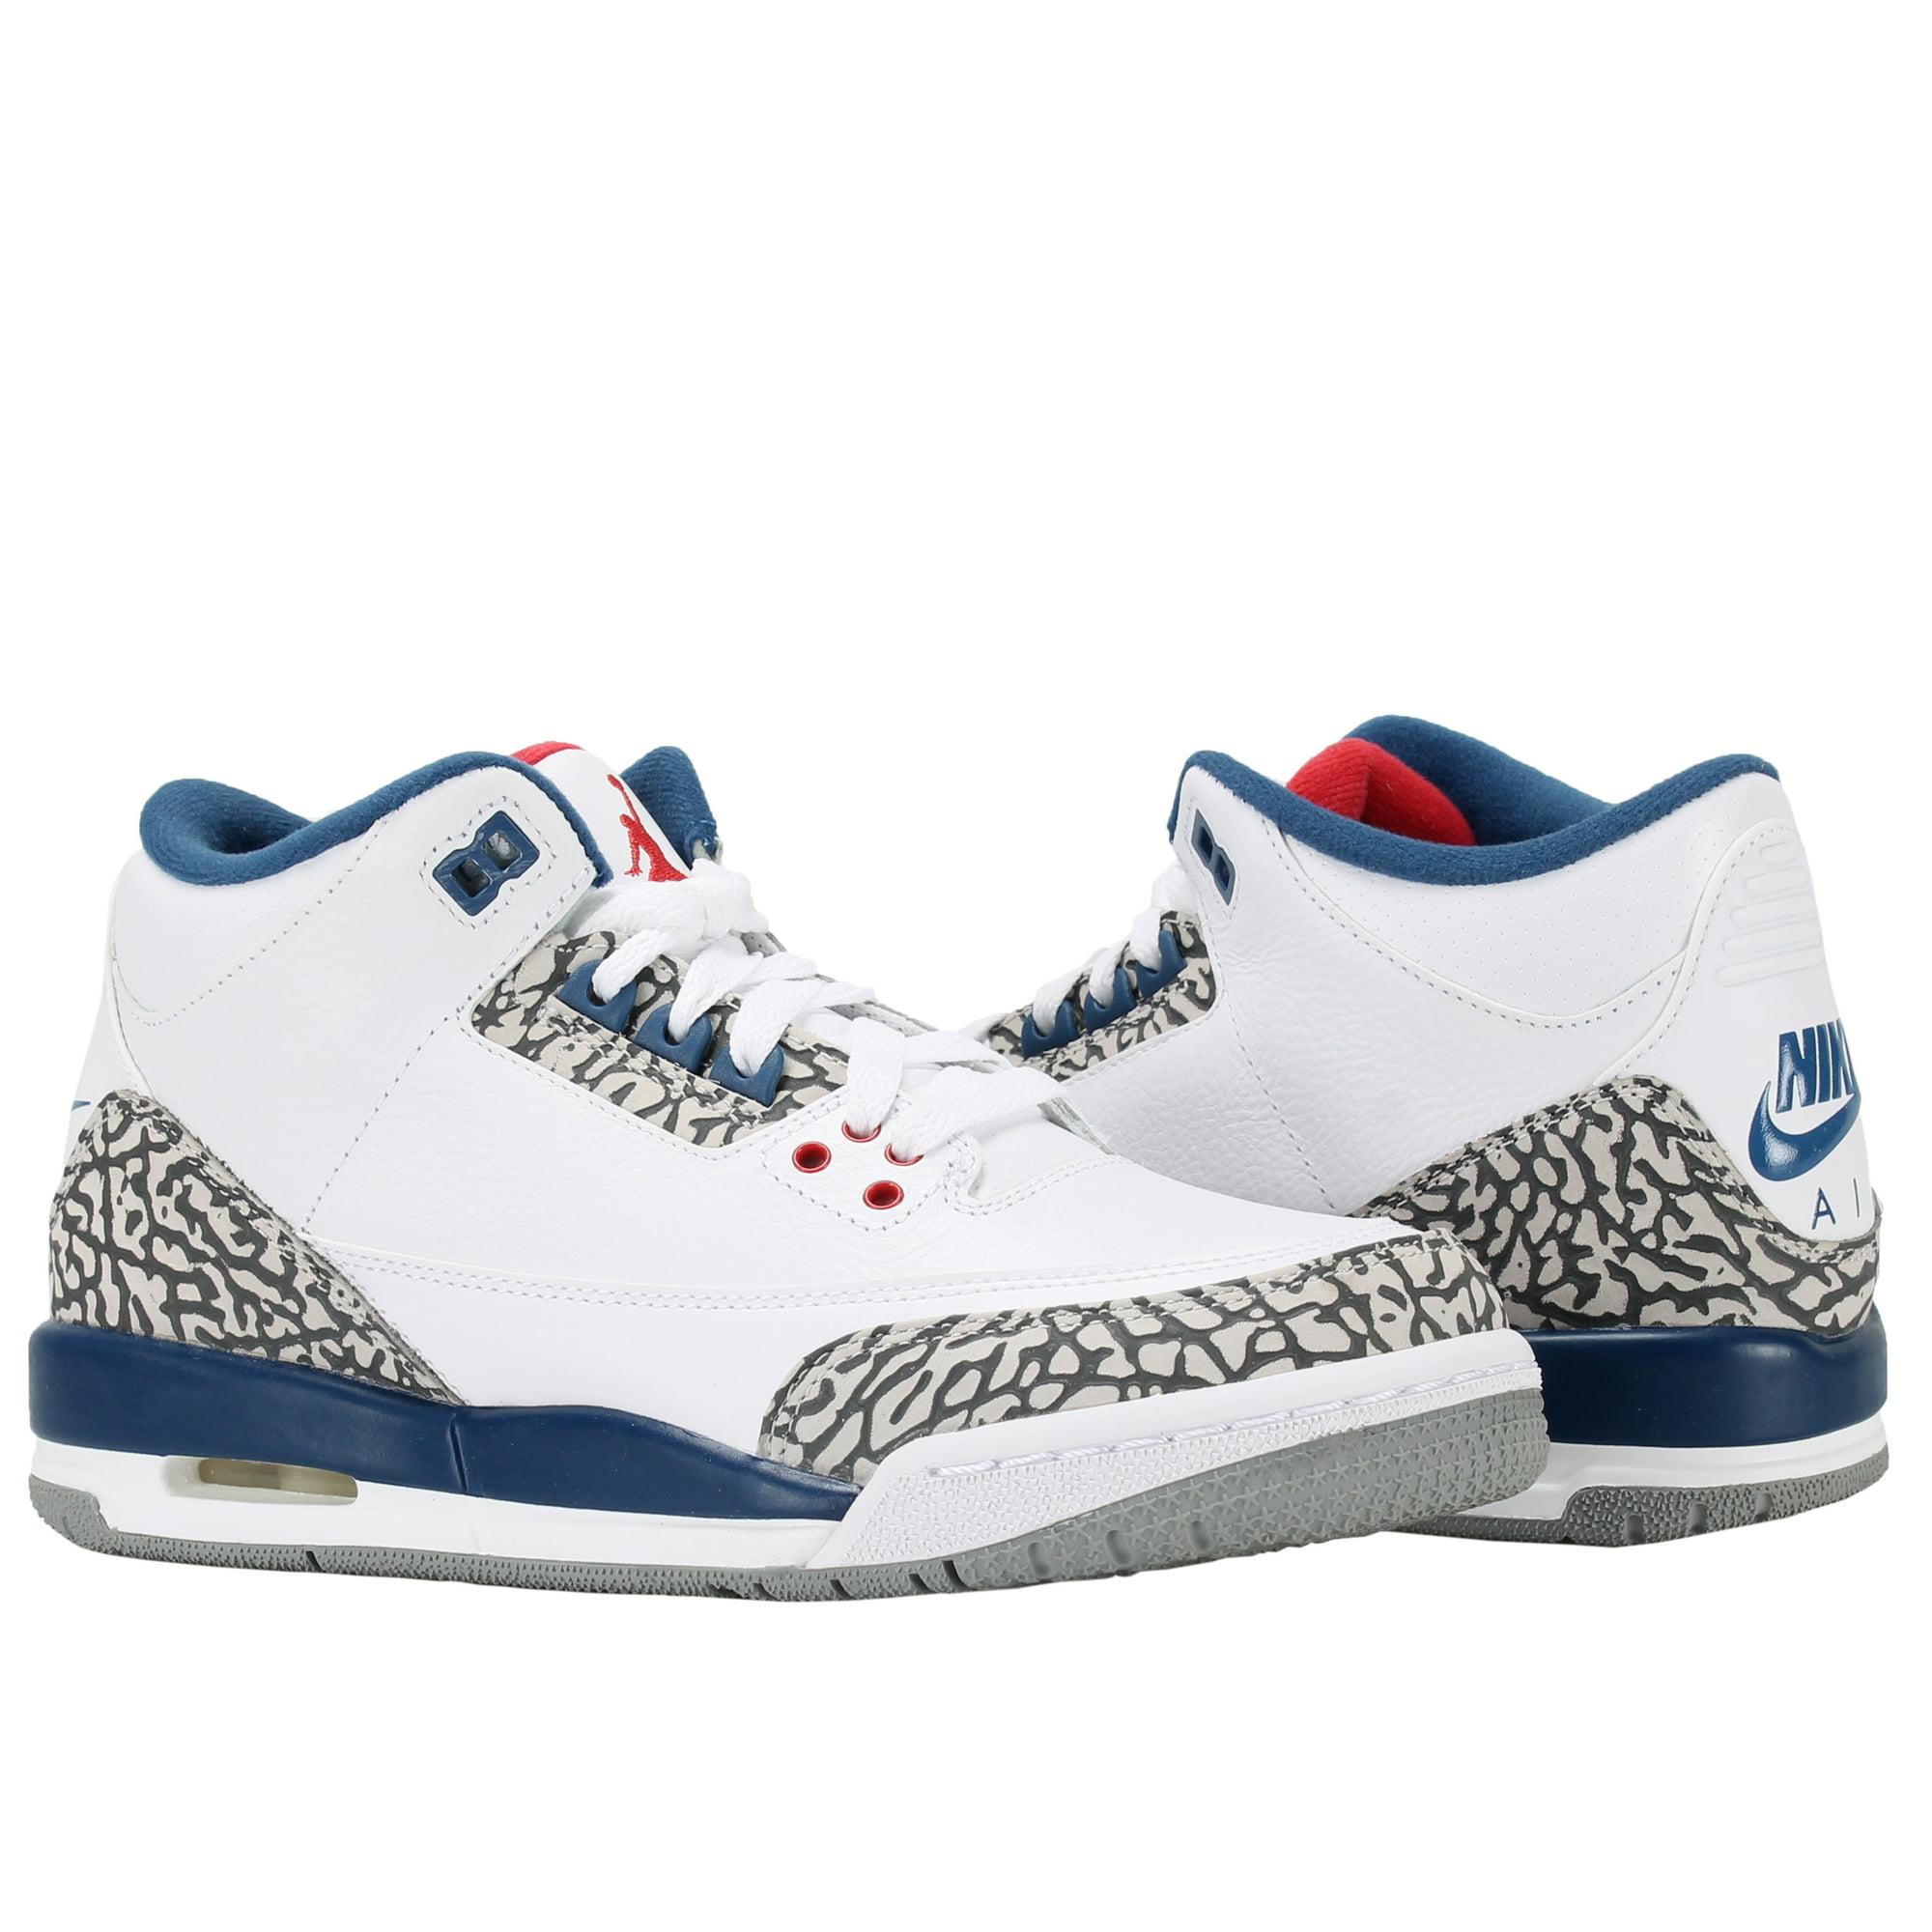 sports shoes 9a740 654aa Nike Air Jordan 3 Retro OG BG True Blue Big Kids Basketball Shoes 854261-106